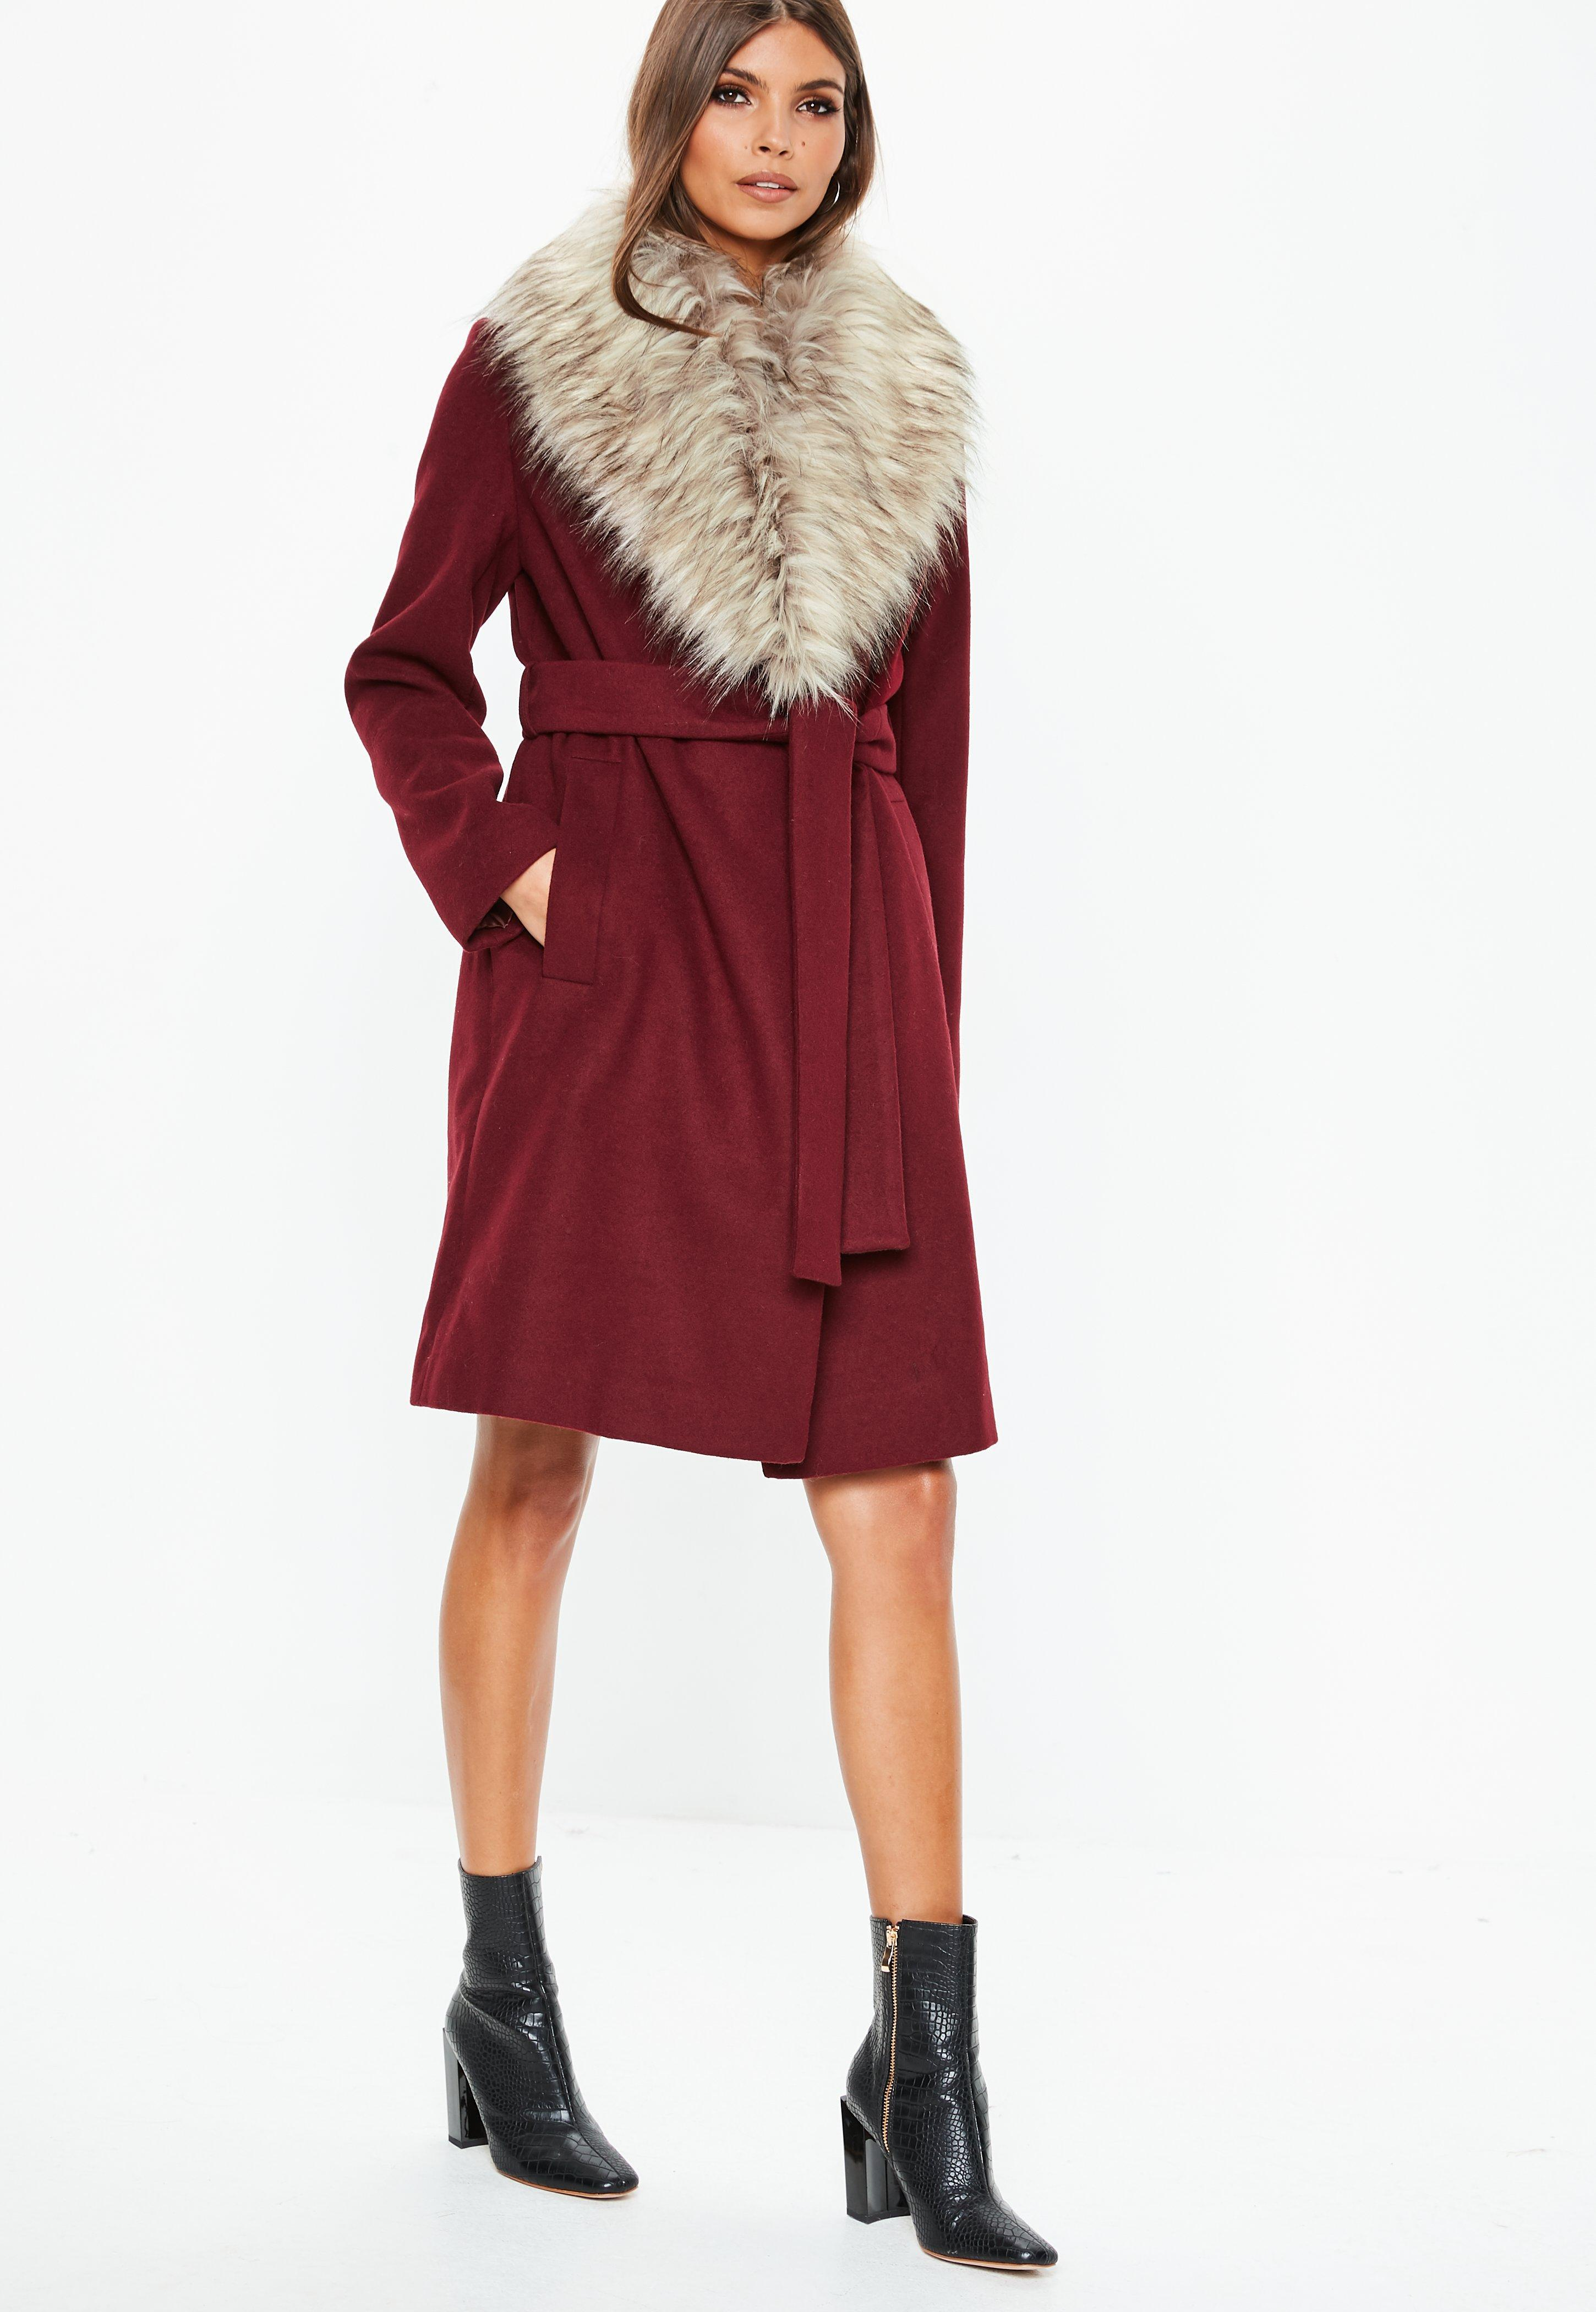 a33ae73e86b8 Missguided - Red Burgundy Faux Fur Collar Coat - Lyst. View fullscreen